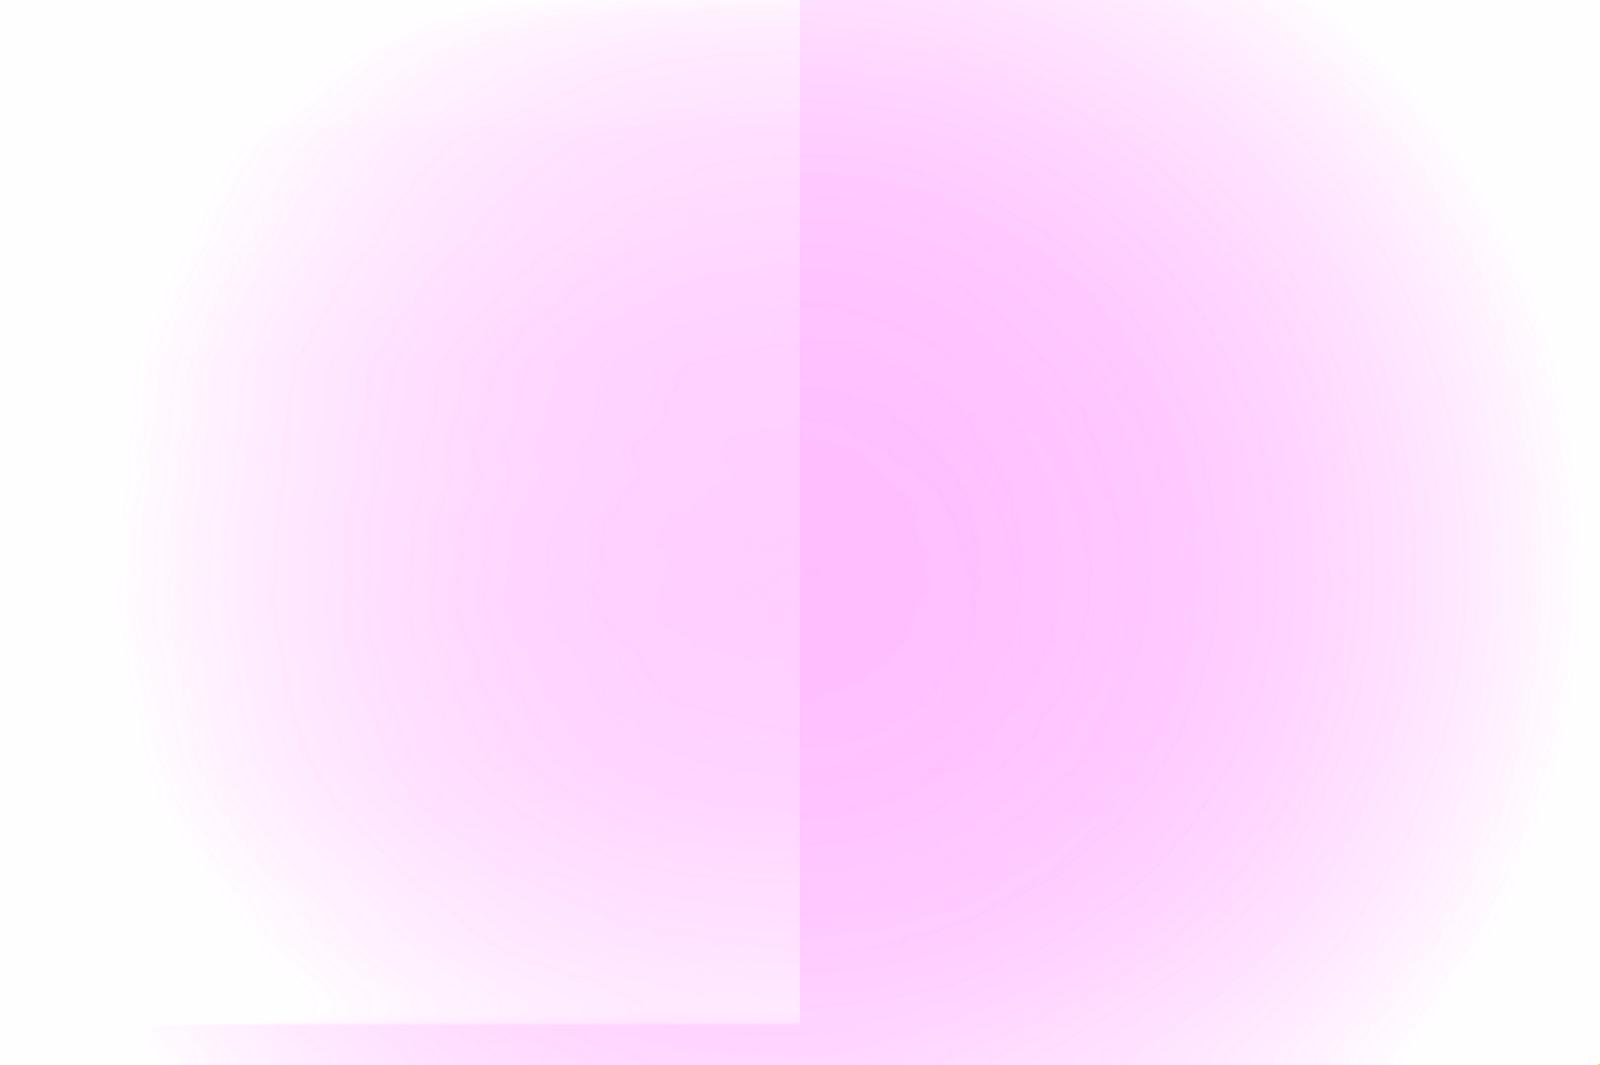 e0253132_21474194.jpg